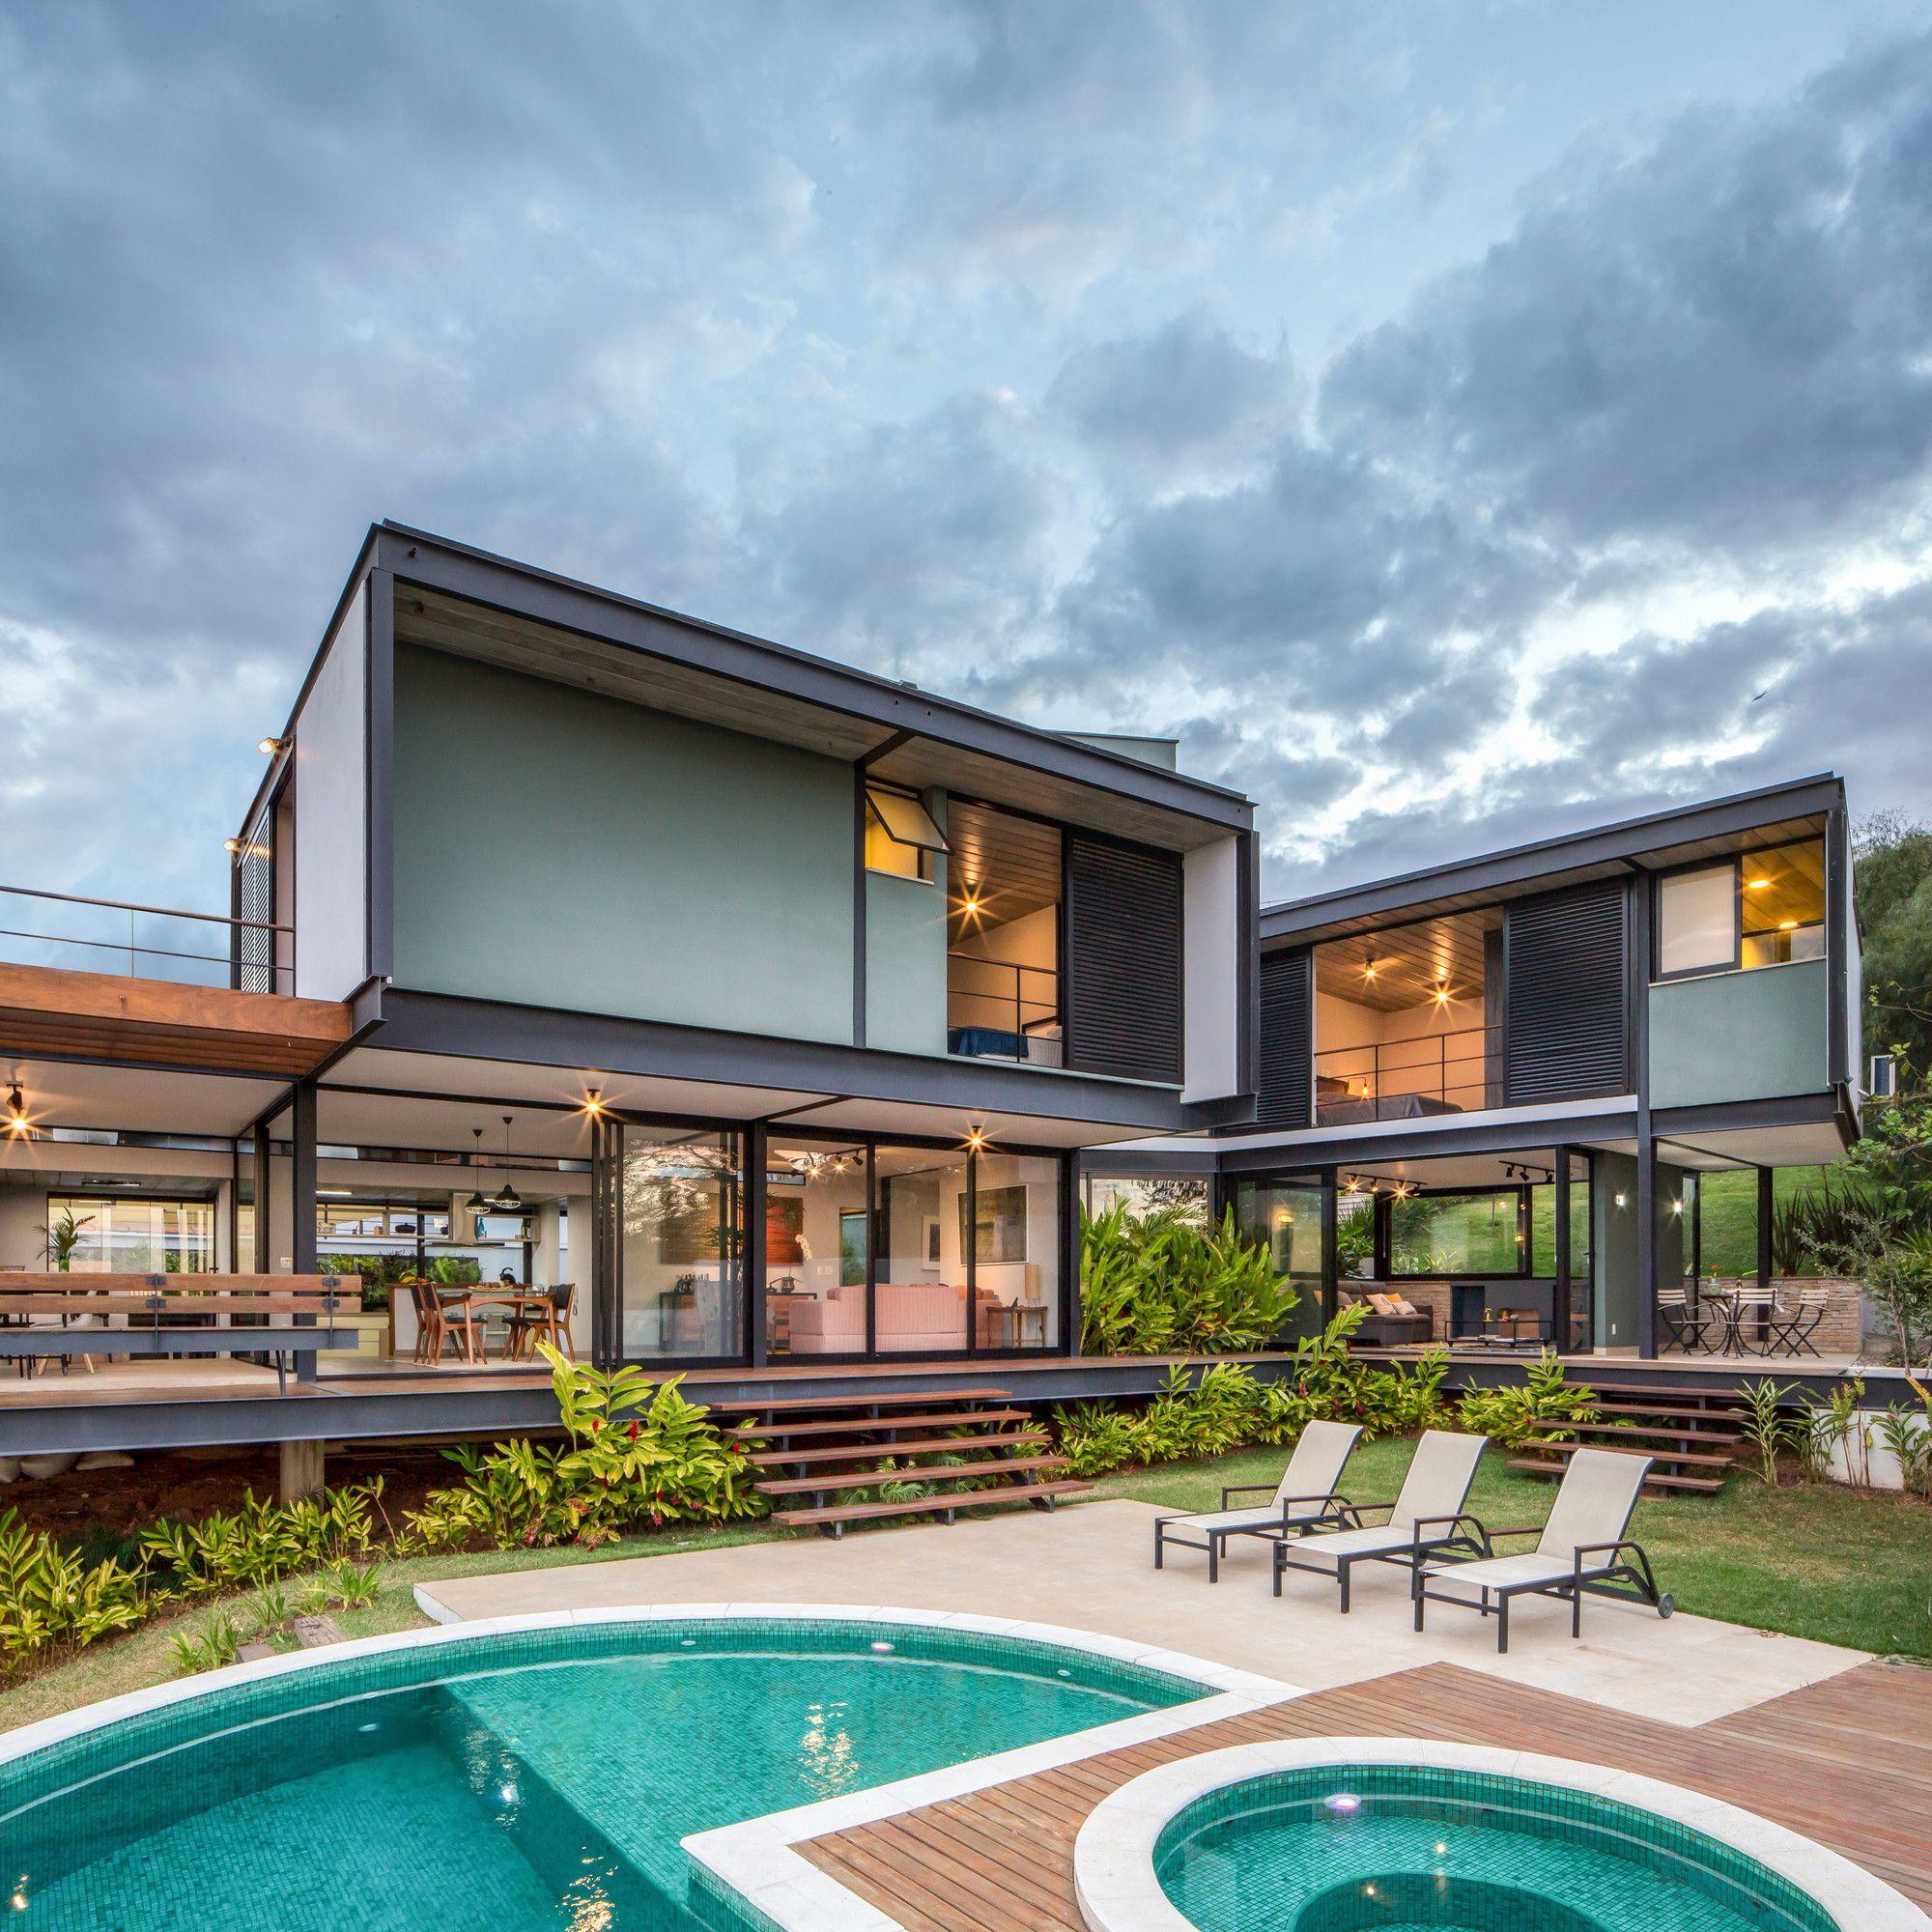 Gallery Of Mt House Telles Arquitetura 21 Modern House Design Architecture House On Stilts